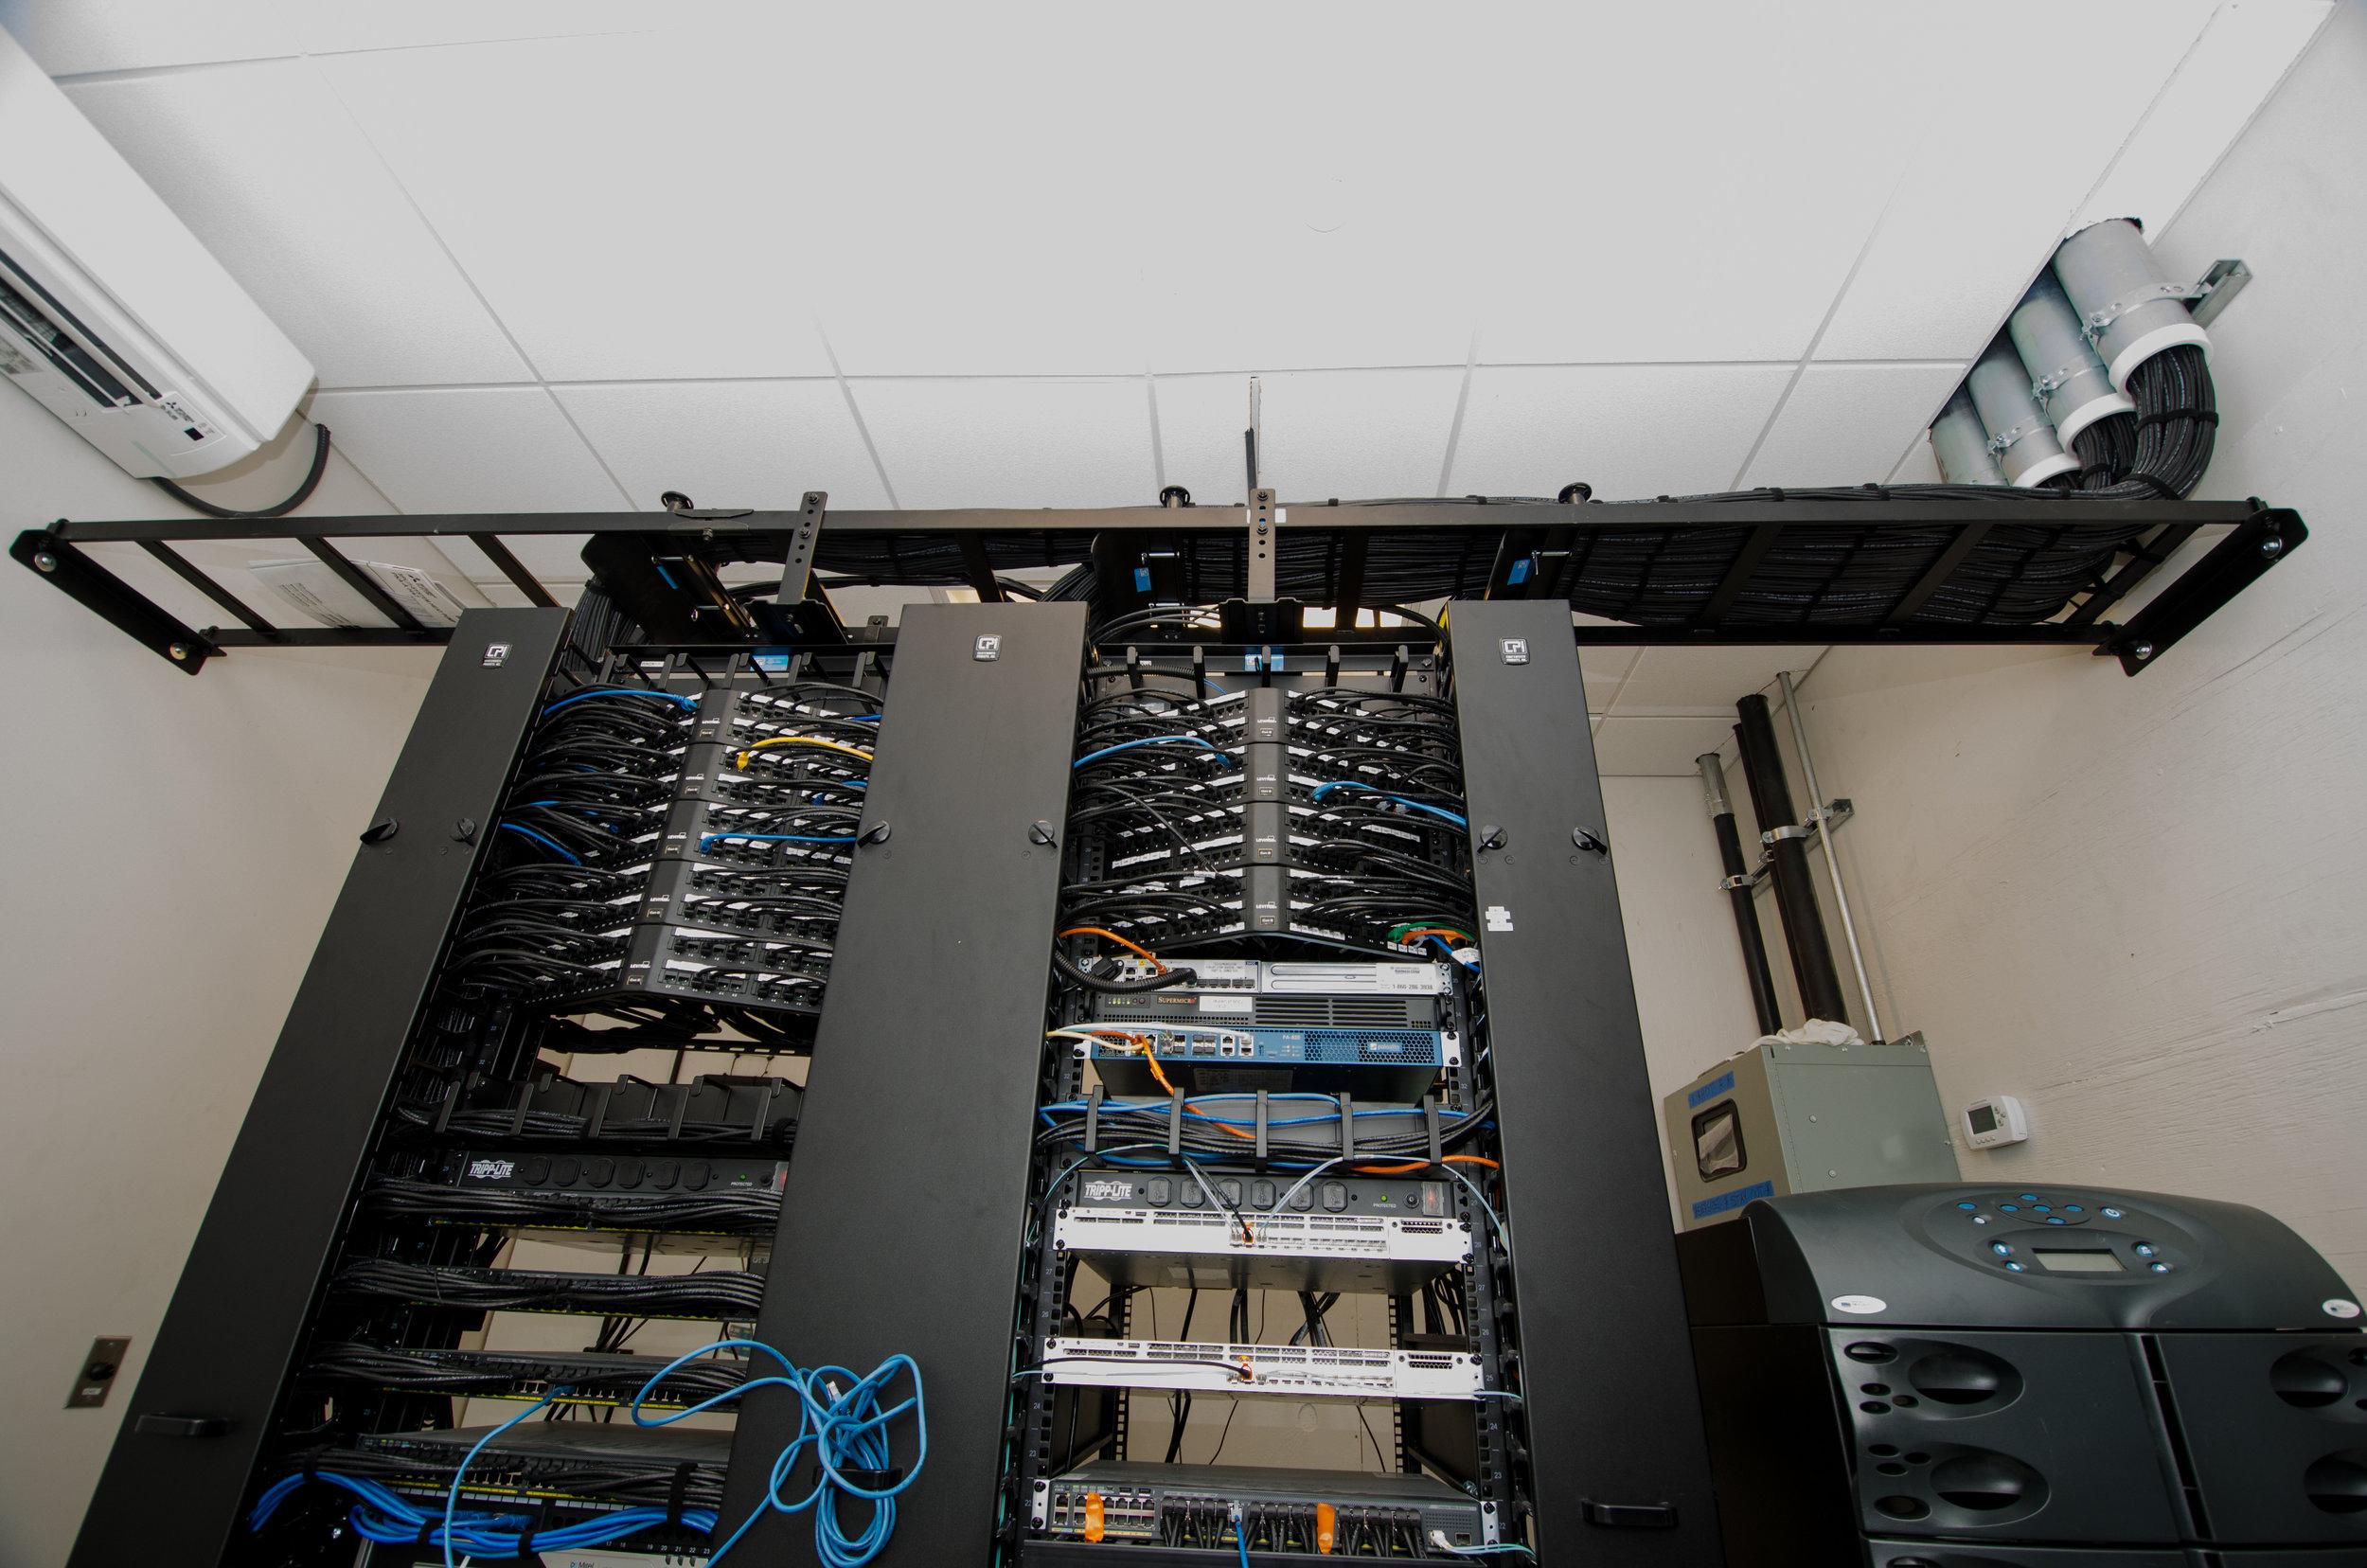 Telecommunications room